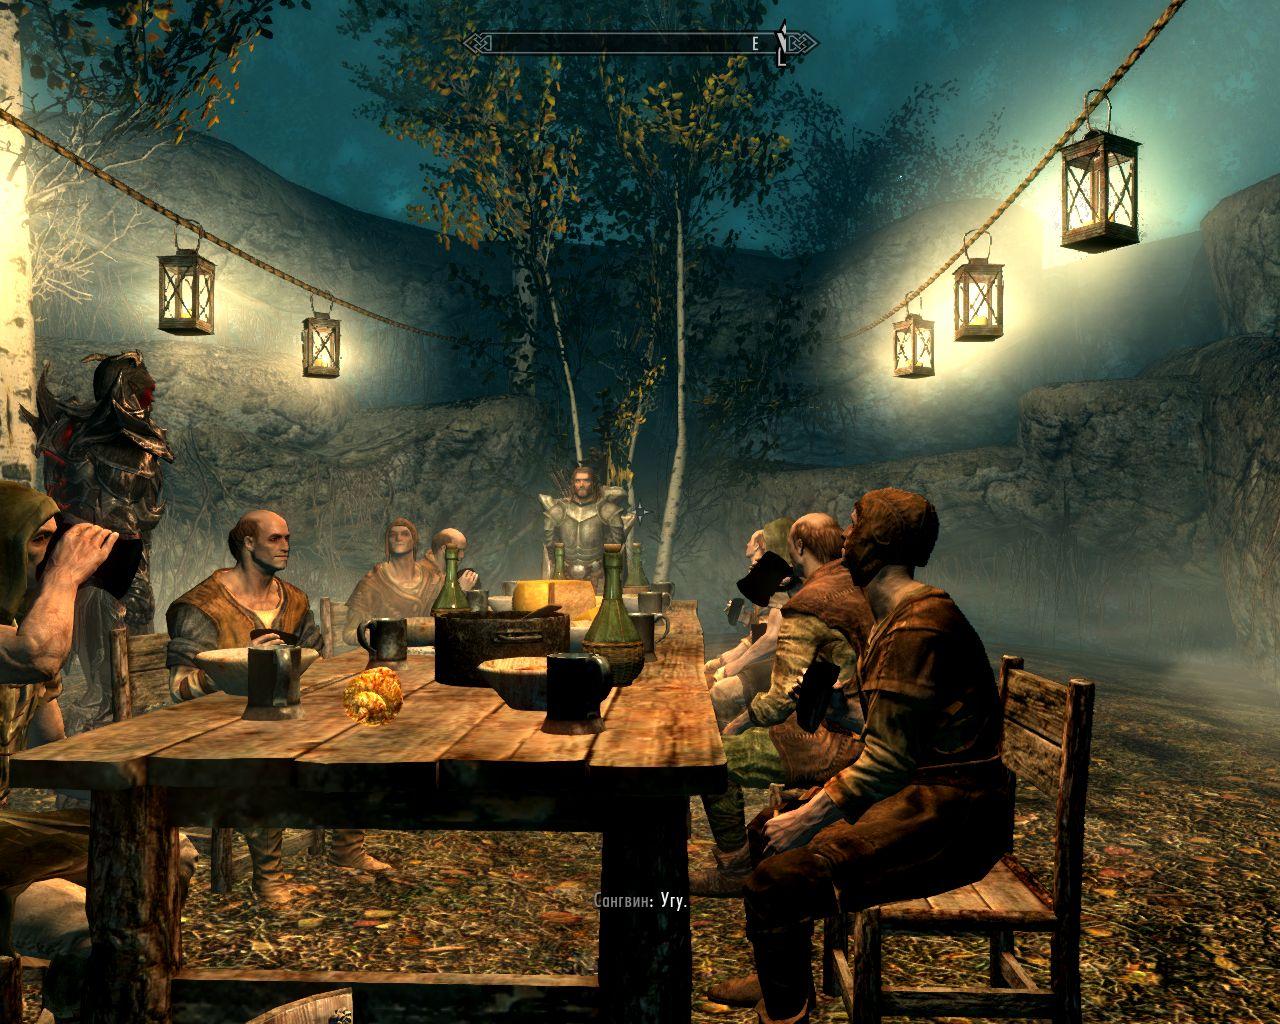 enb2013_1_19_18_57_56.jpg - Elder Scrolls 5: Skyrim, the